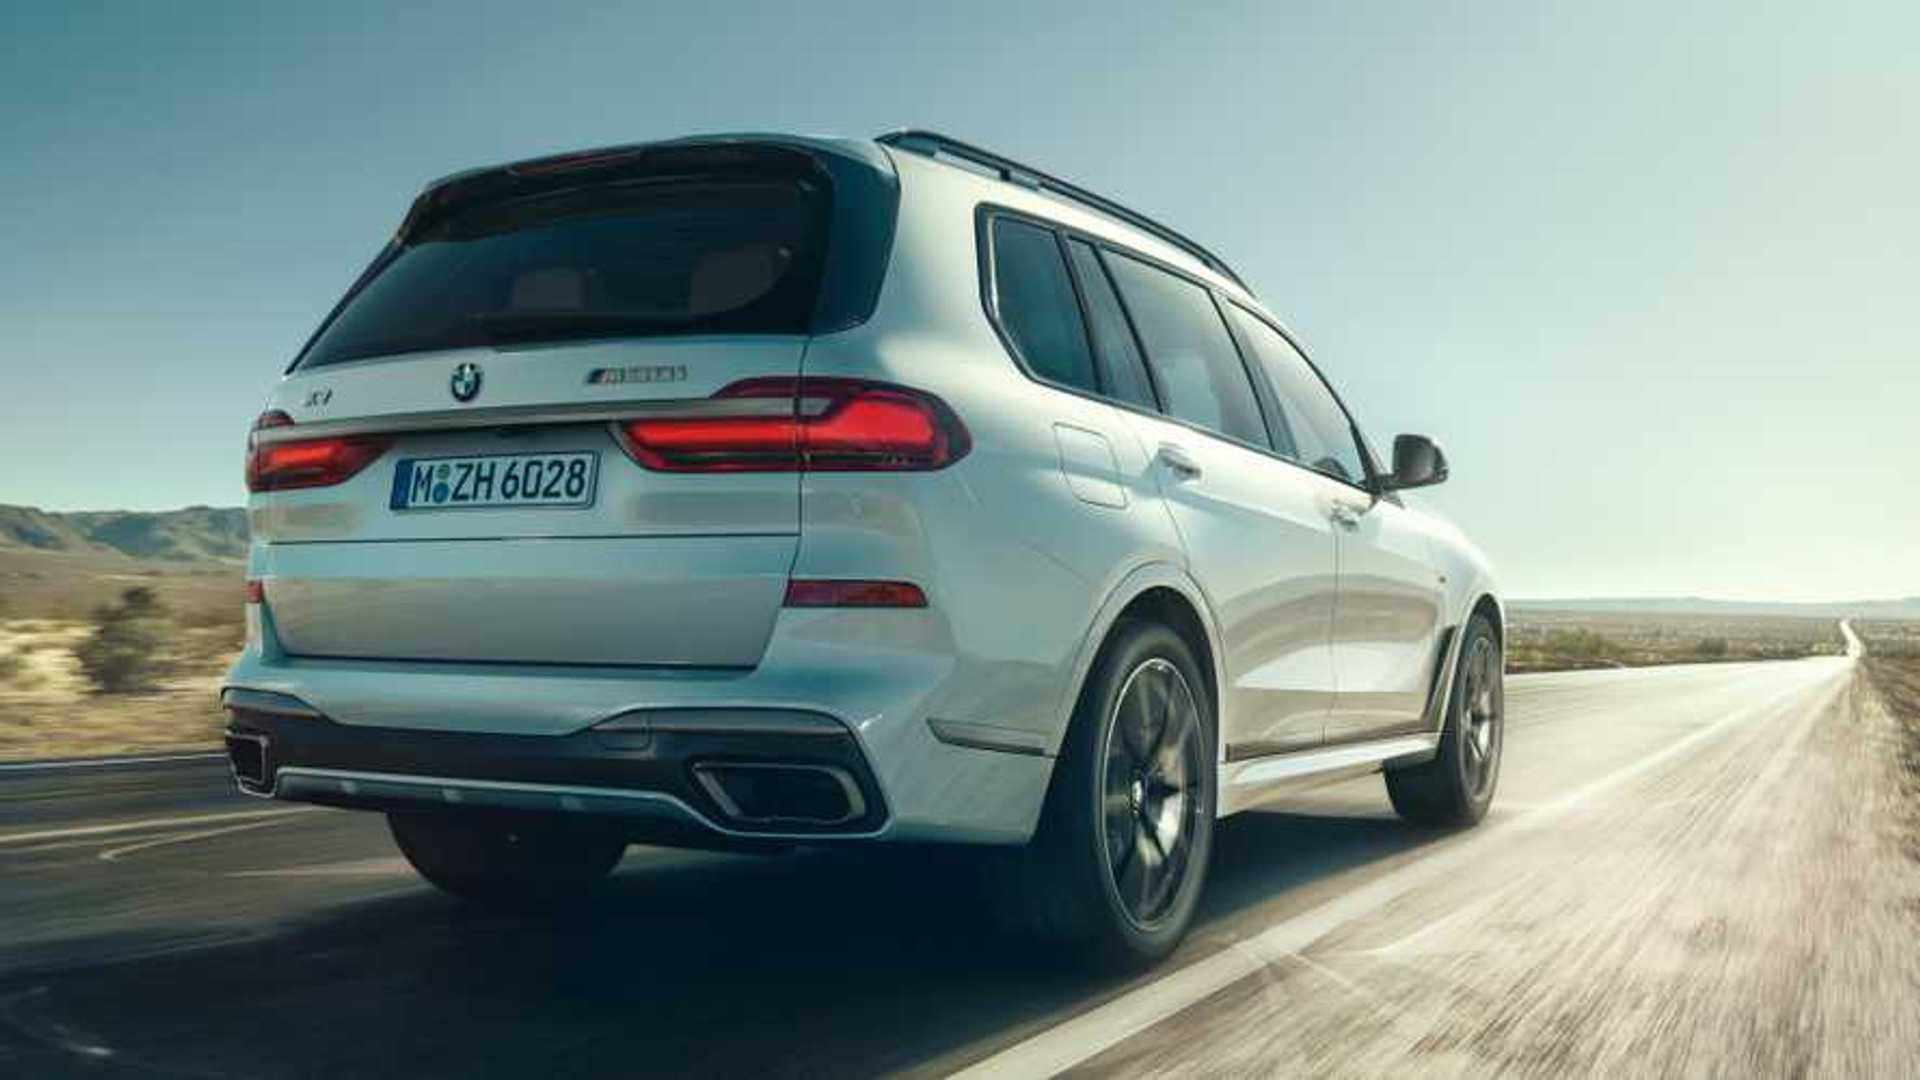 BMW X5 M50i, X7 M50i Debut As Company's Most Powerful SUVs